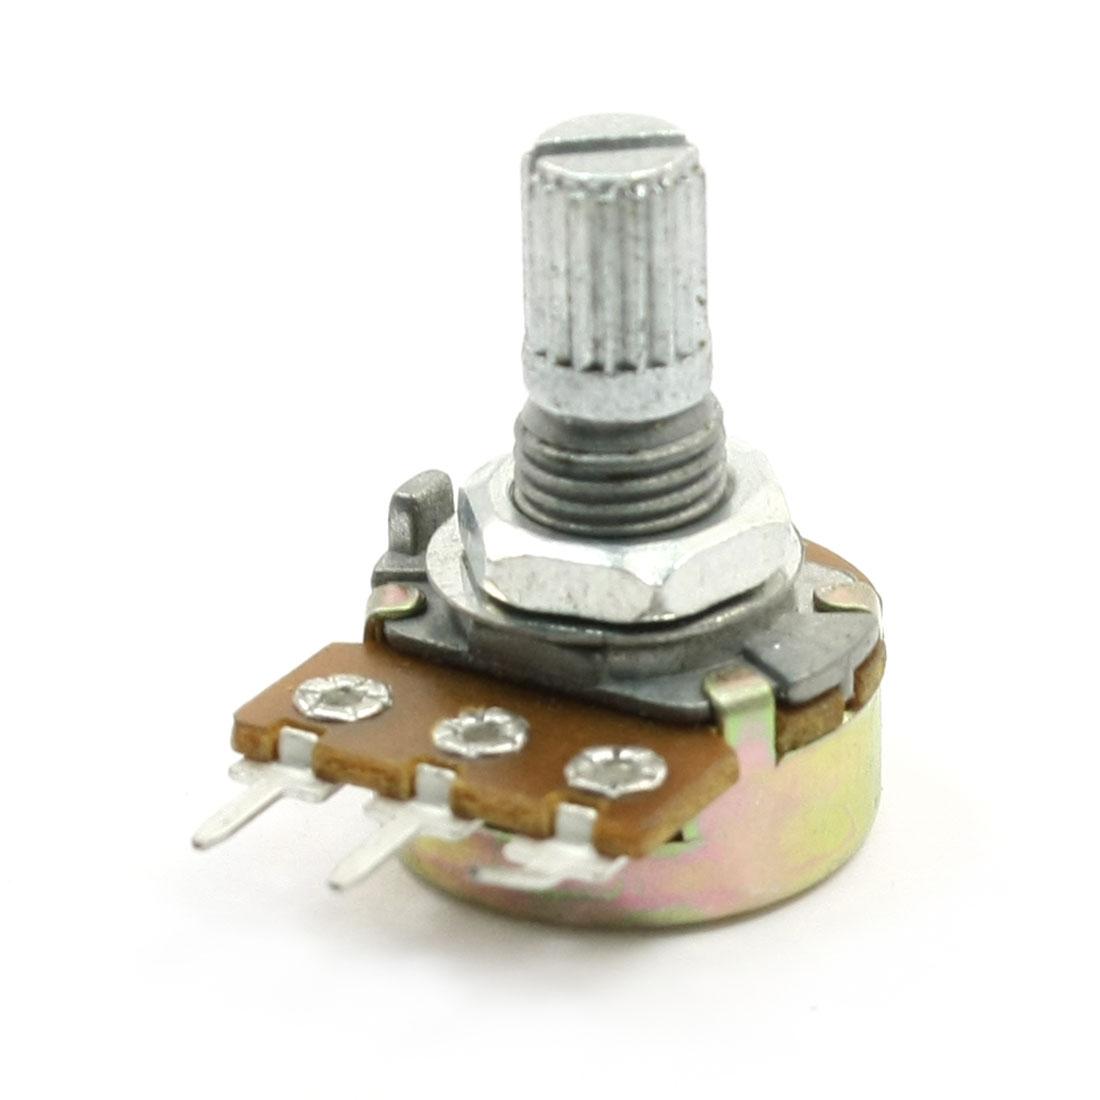 B50K 50K Ohm Adjustment Single Linear Rotary Taper Potentiometer